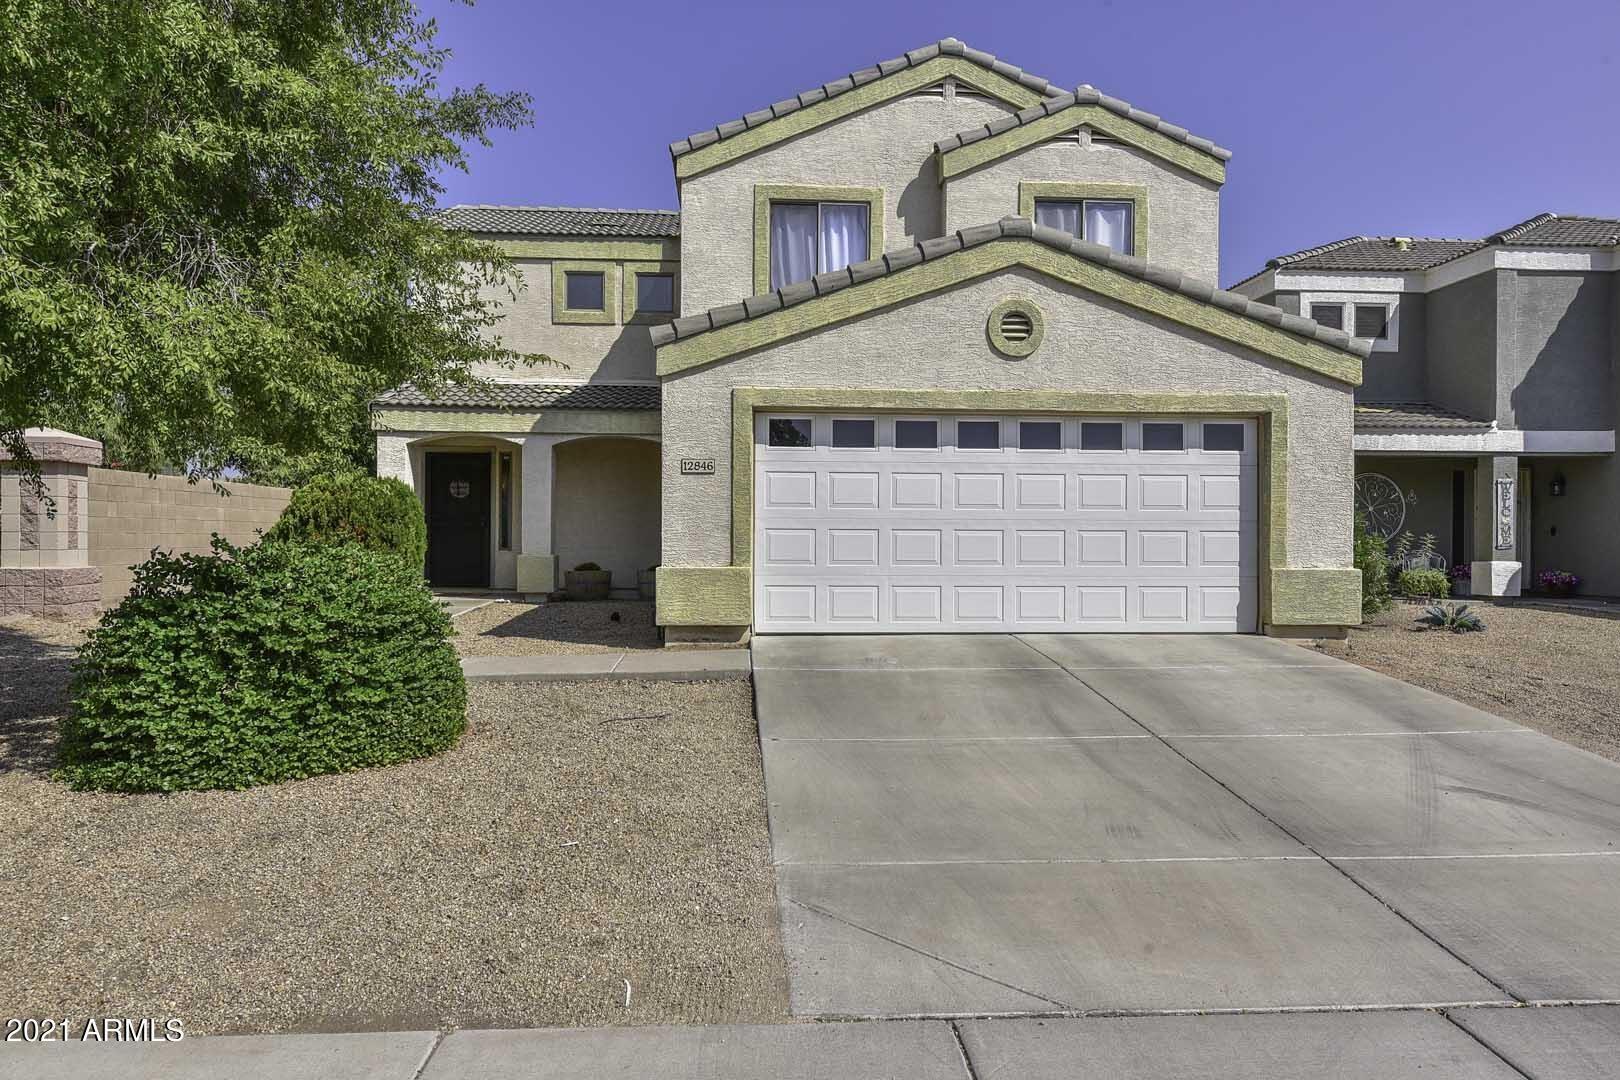 Photo of 12846 W SOLEDAD Street, El Mirage, AZ 85335 (MLS # 6294432)